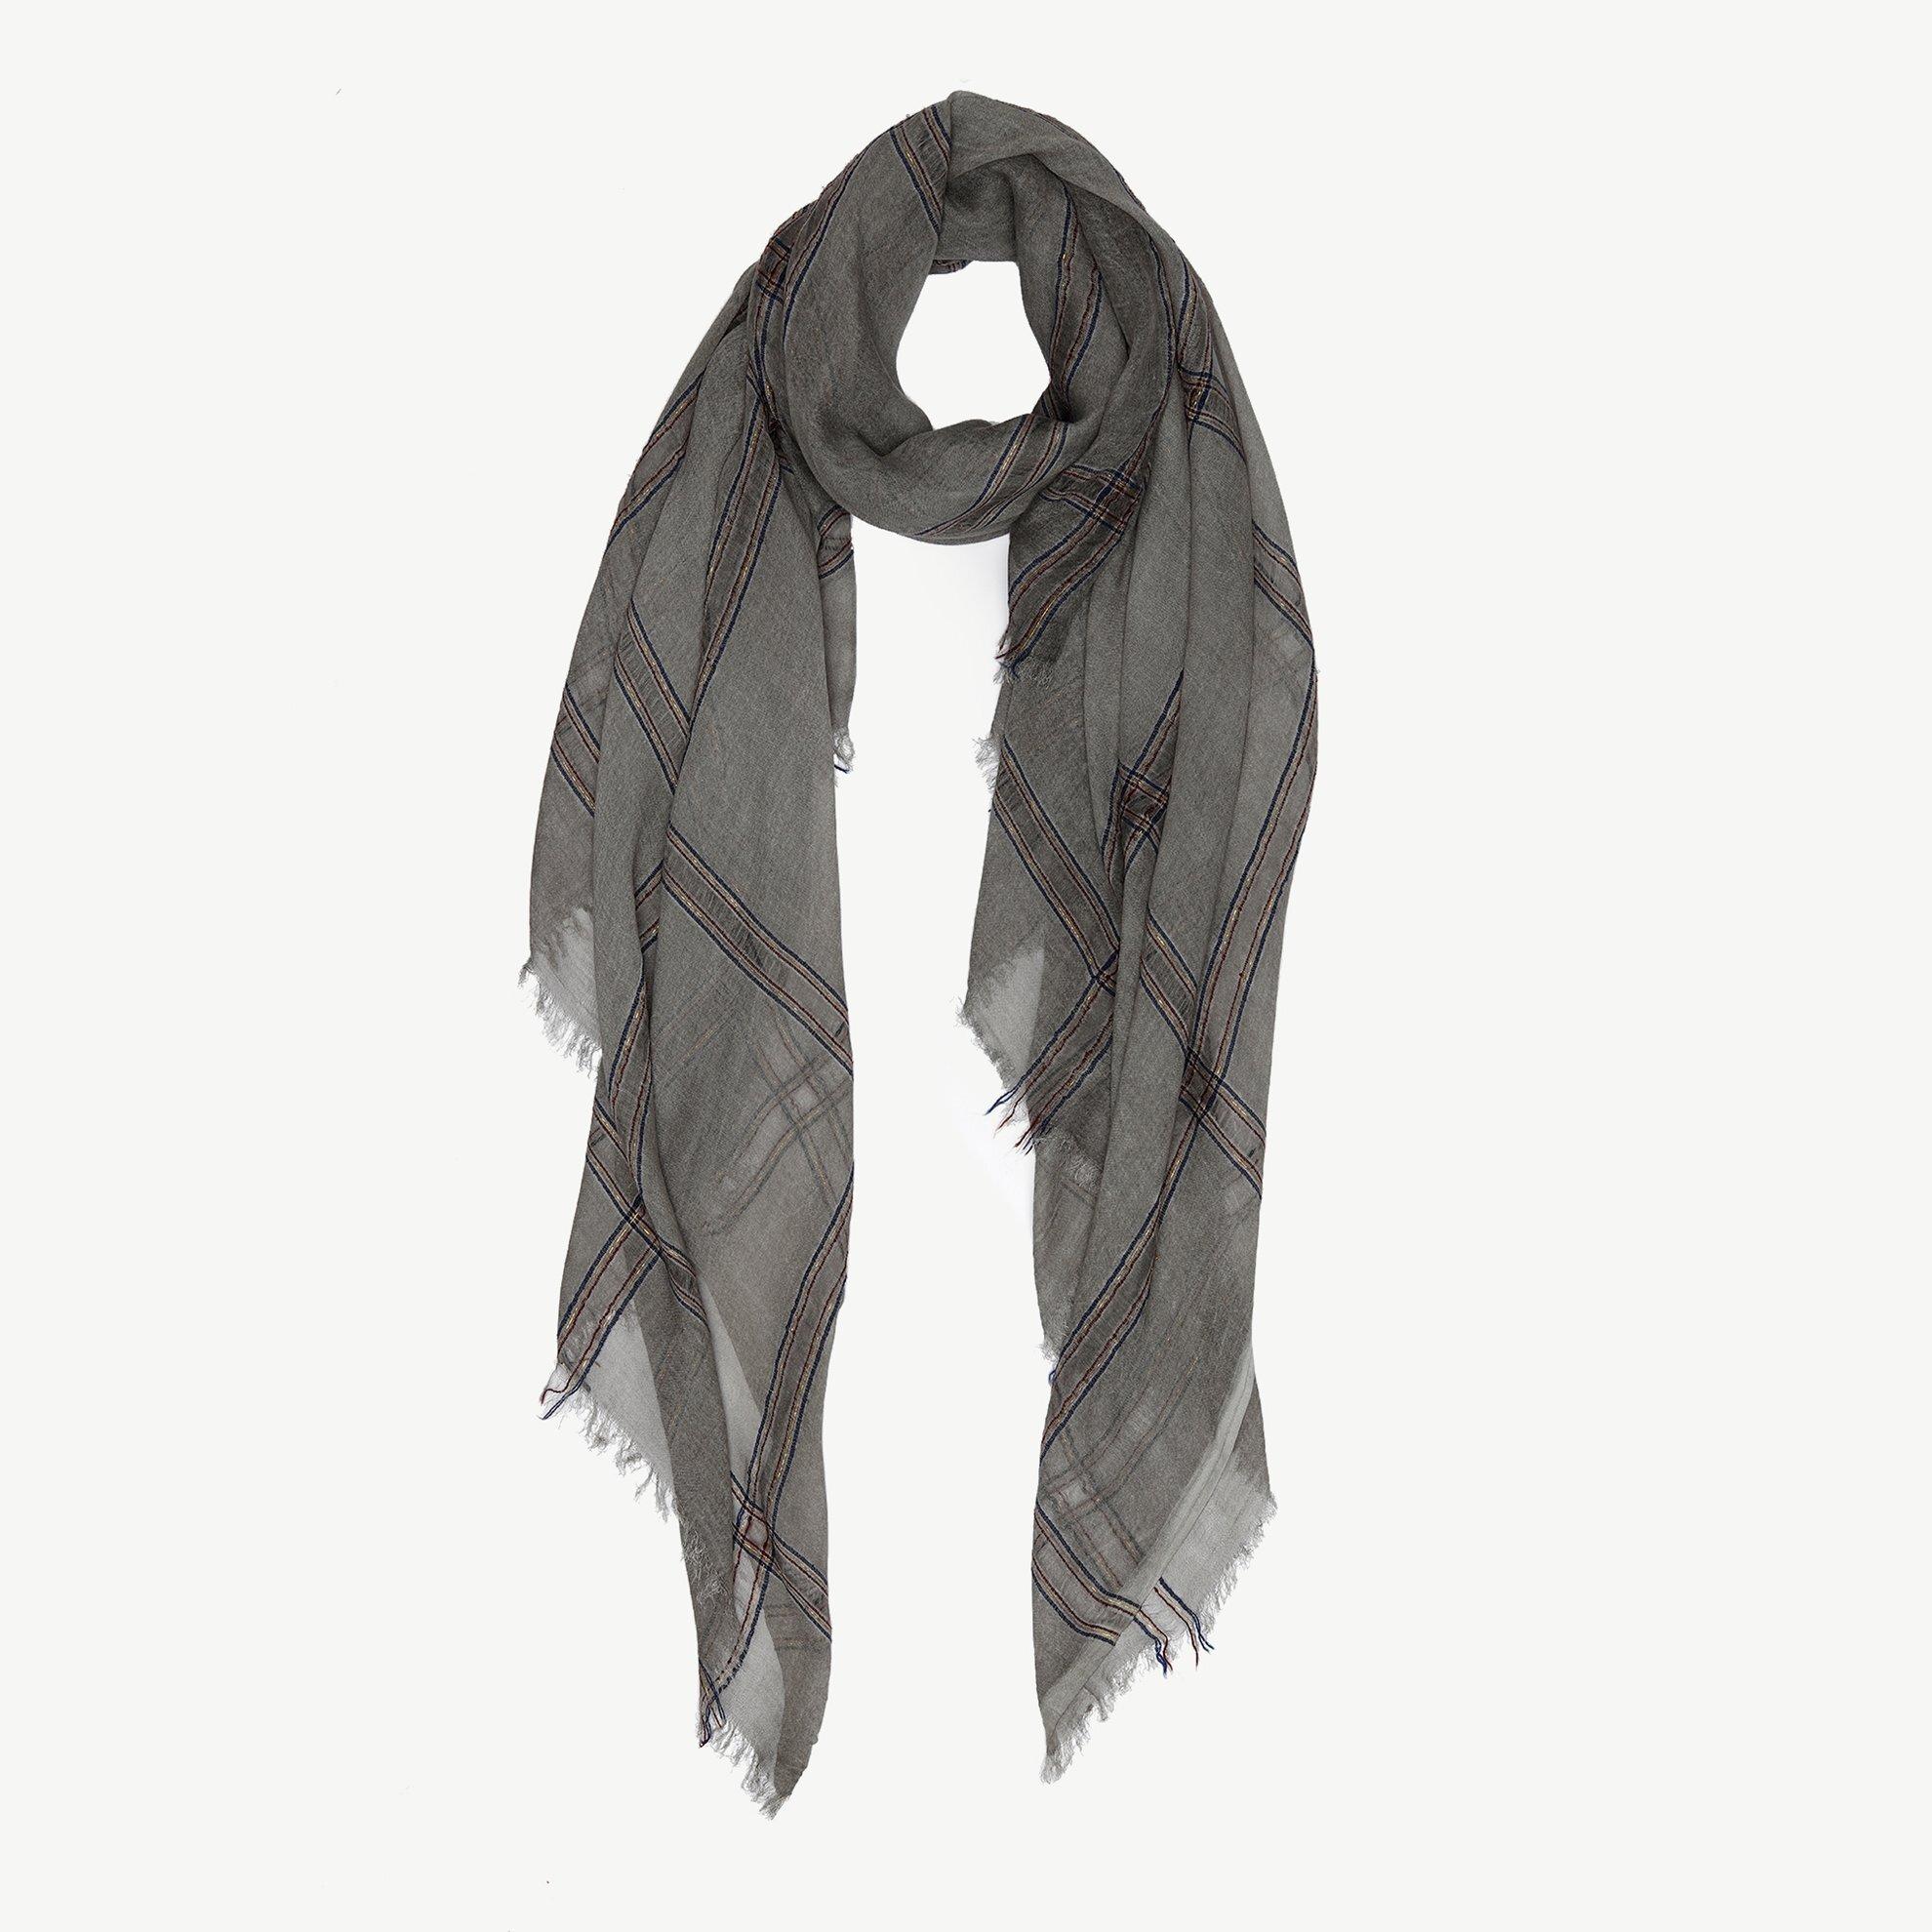 Silbriger Schal